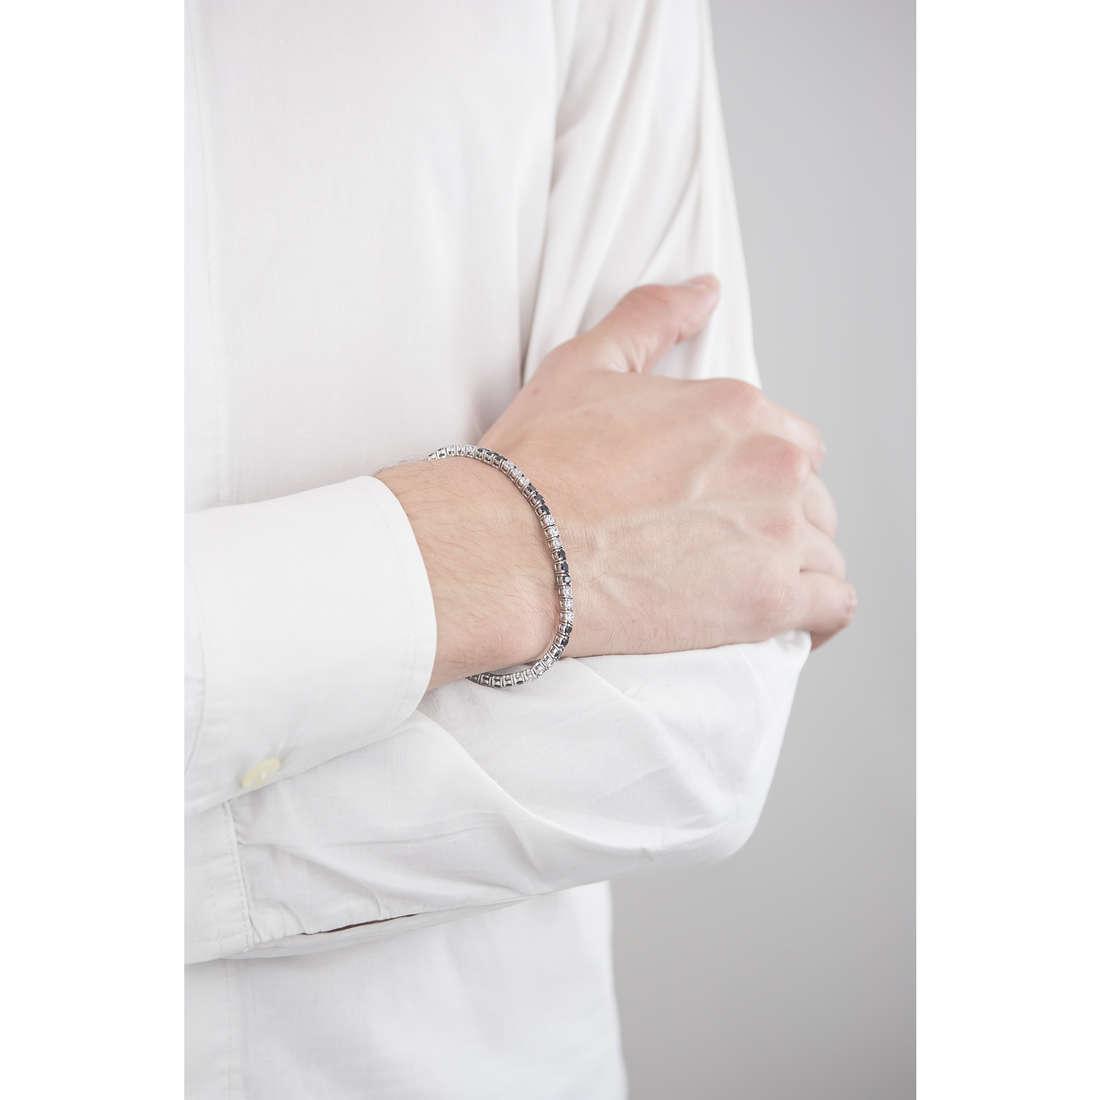 Luca Barra bracciali uomo LBBA740 indosso